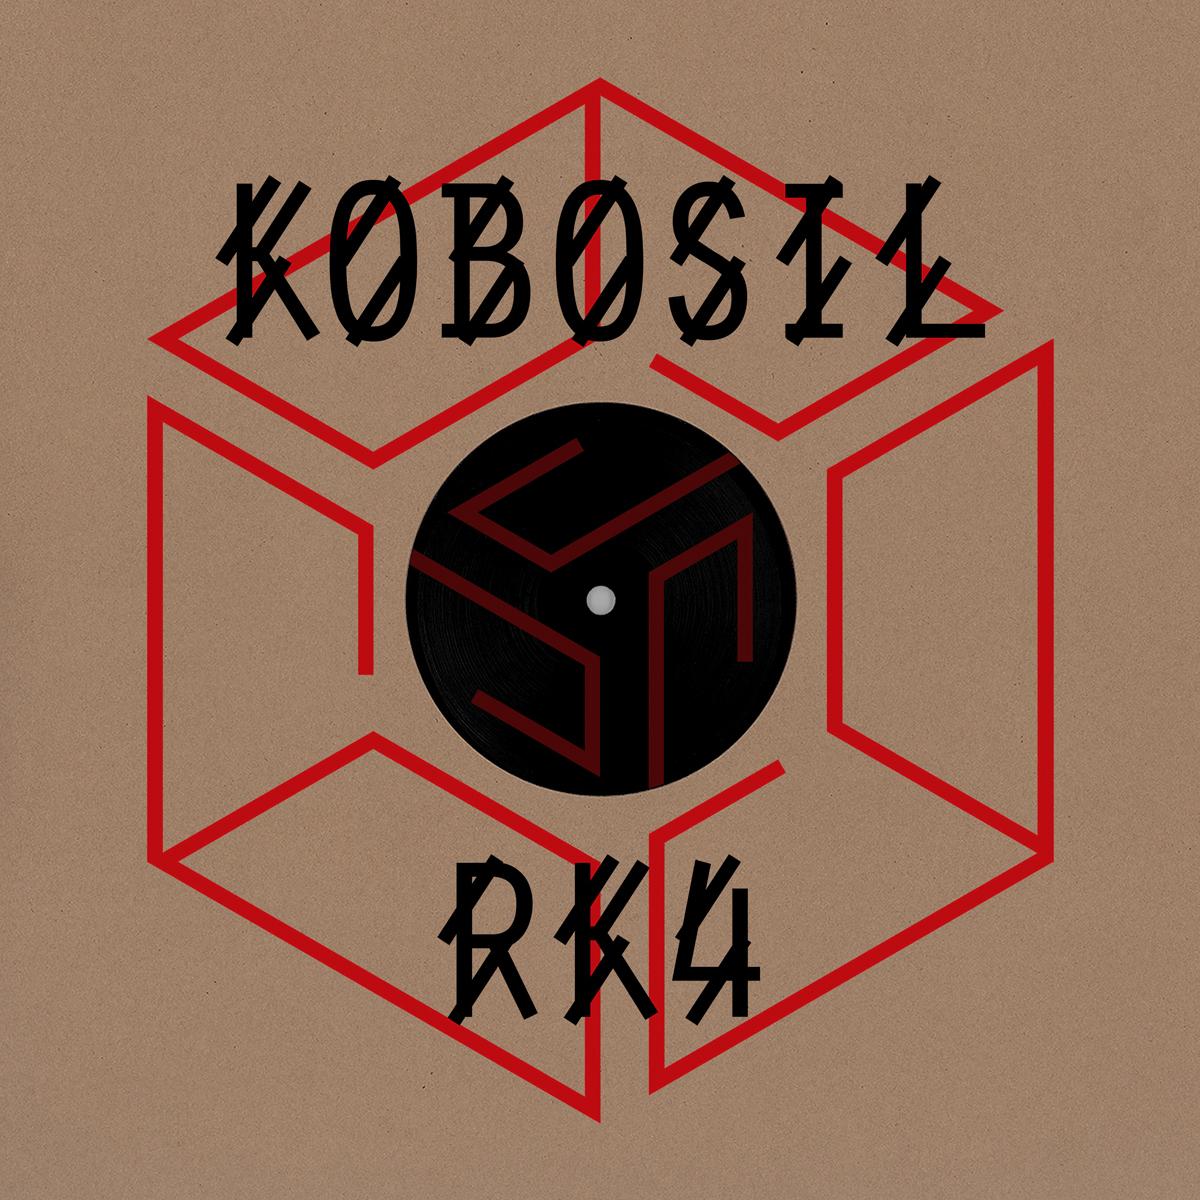 RK4_4_front.jpg